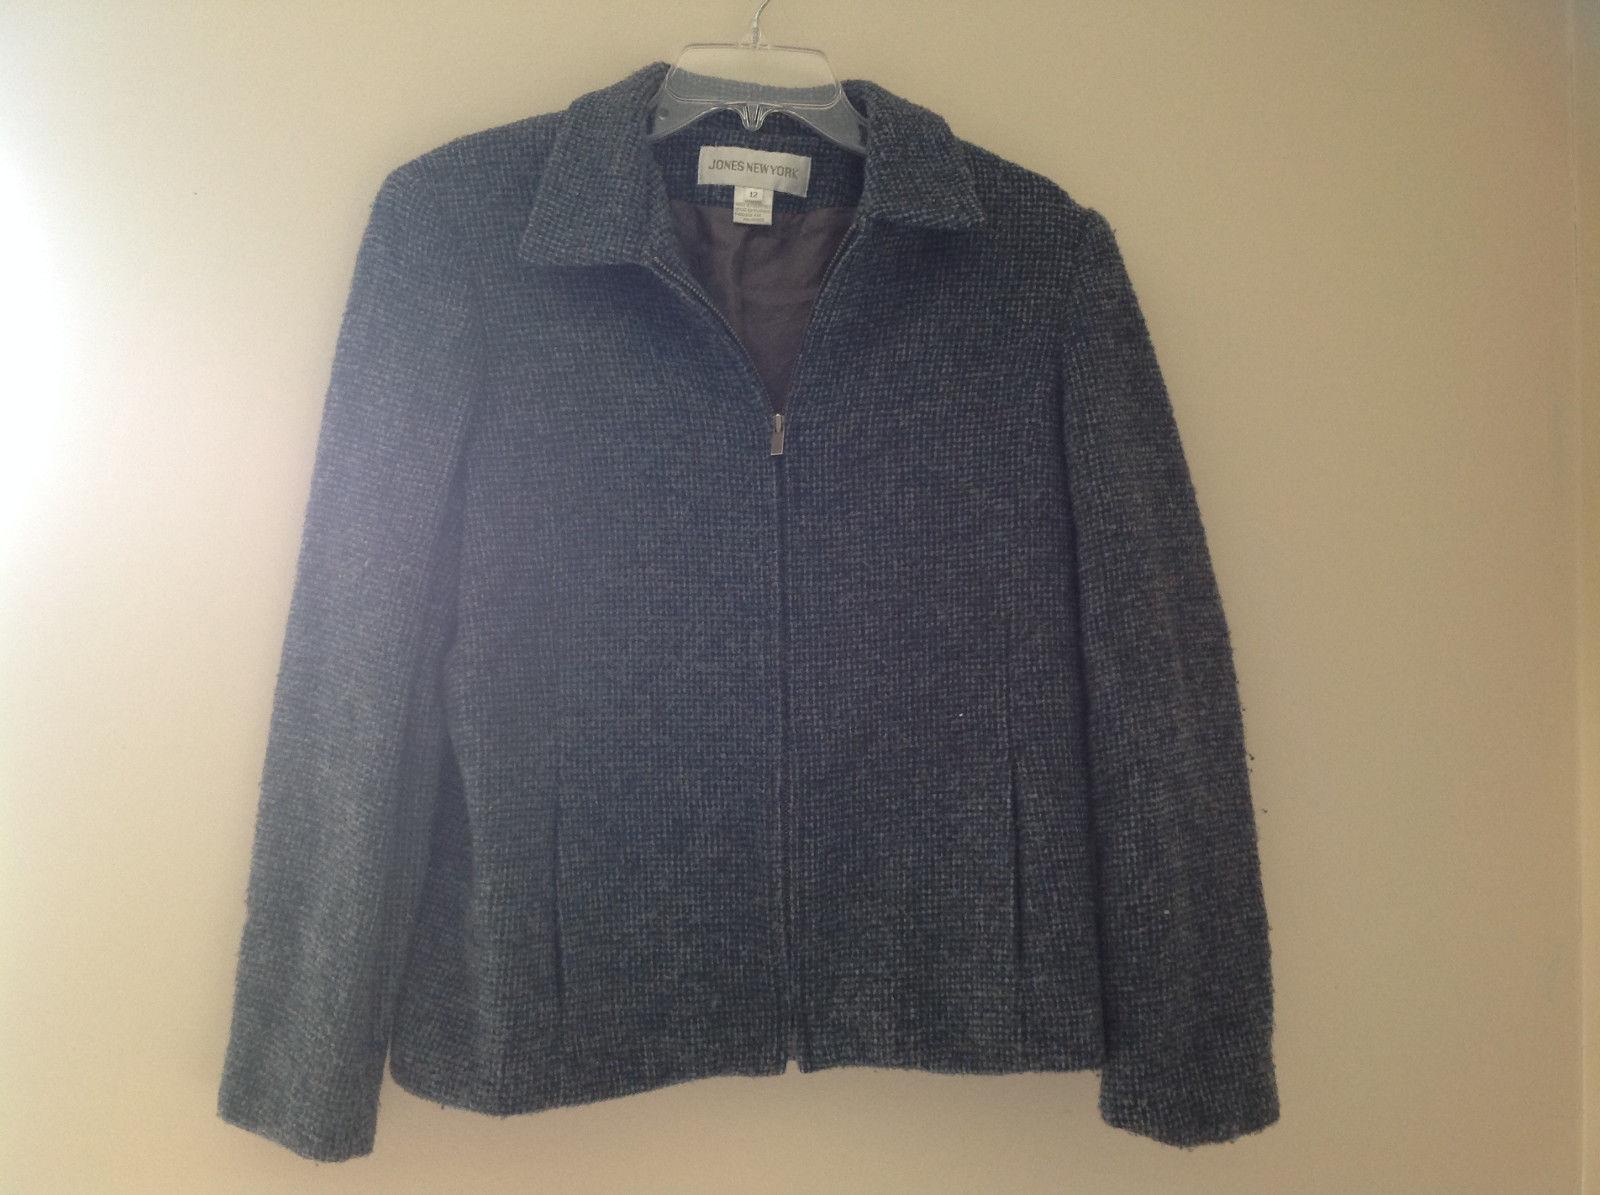 Blue Jones New York Twill Like Pattern Collared Light Winter Jacket Size 12